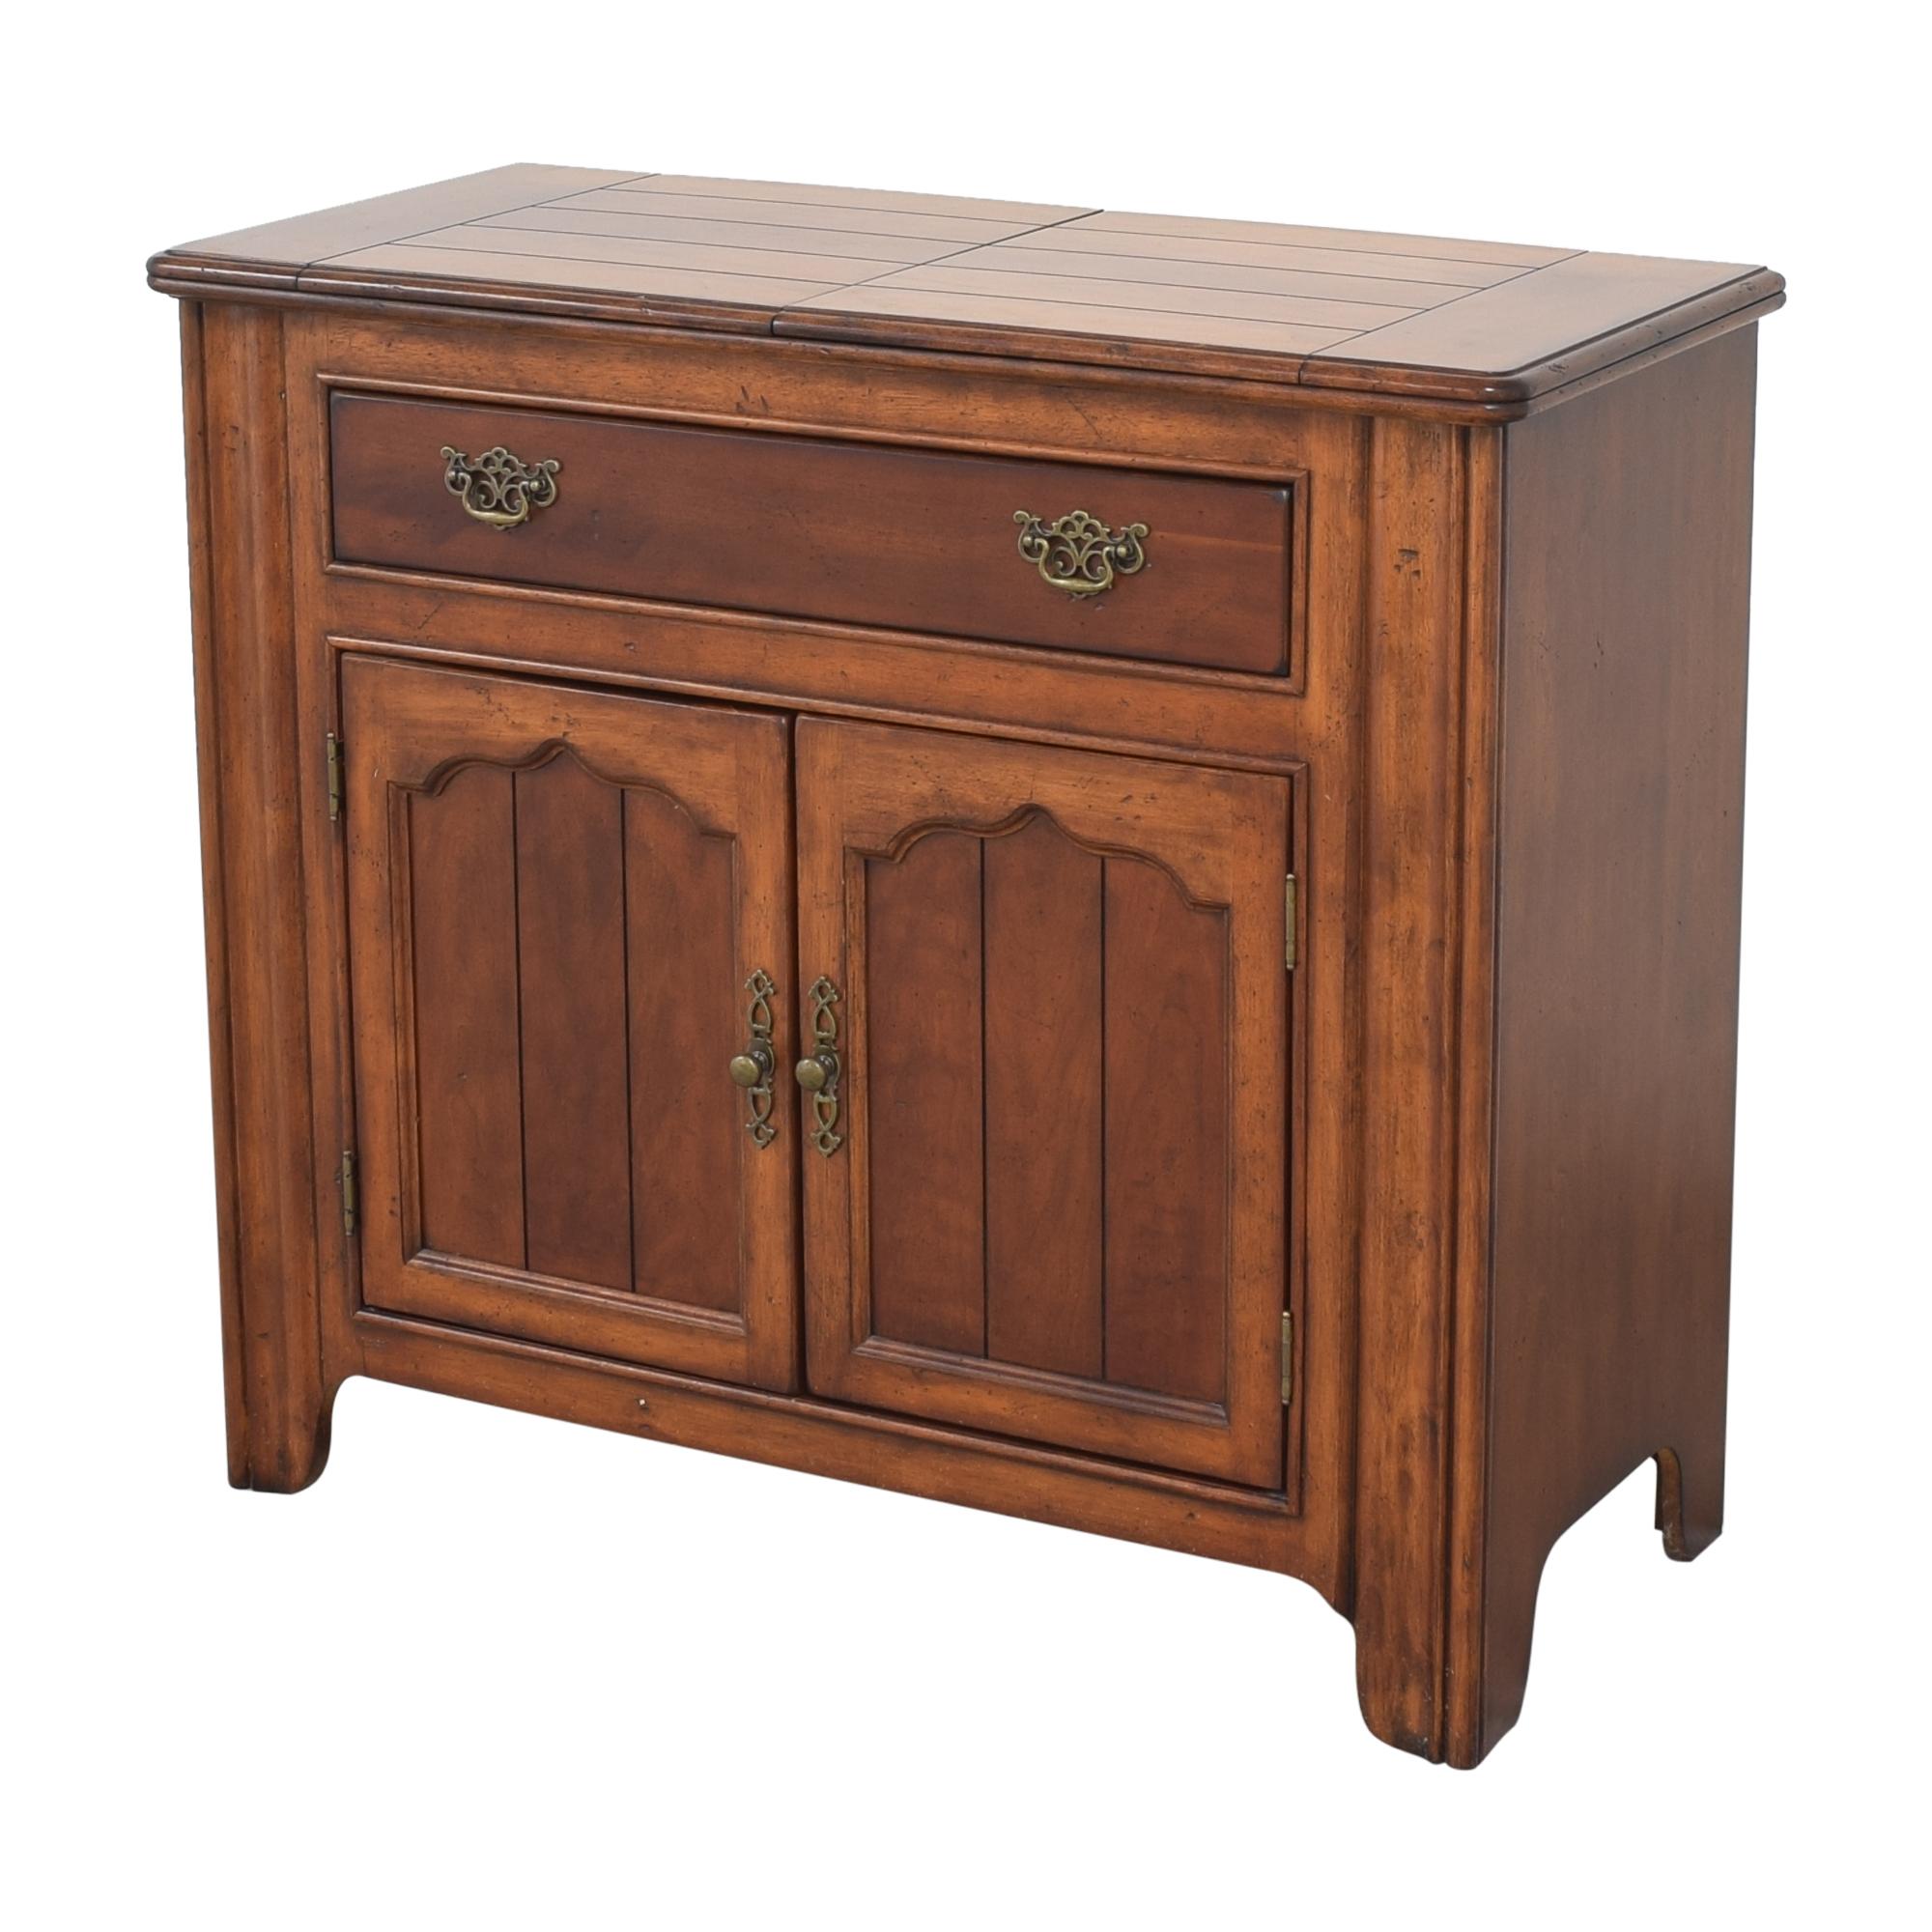 Universal Furniture Universal Furniture Flip Top Server Buffet price